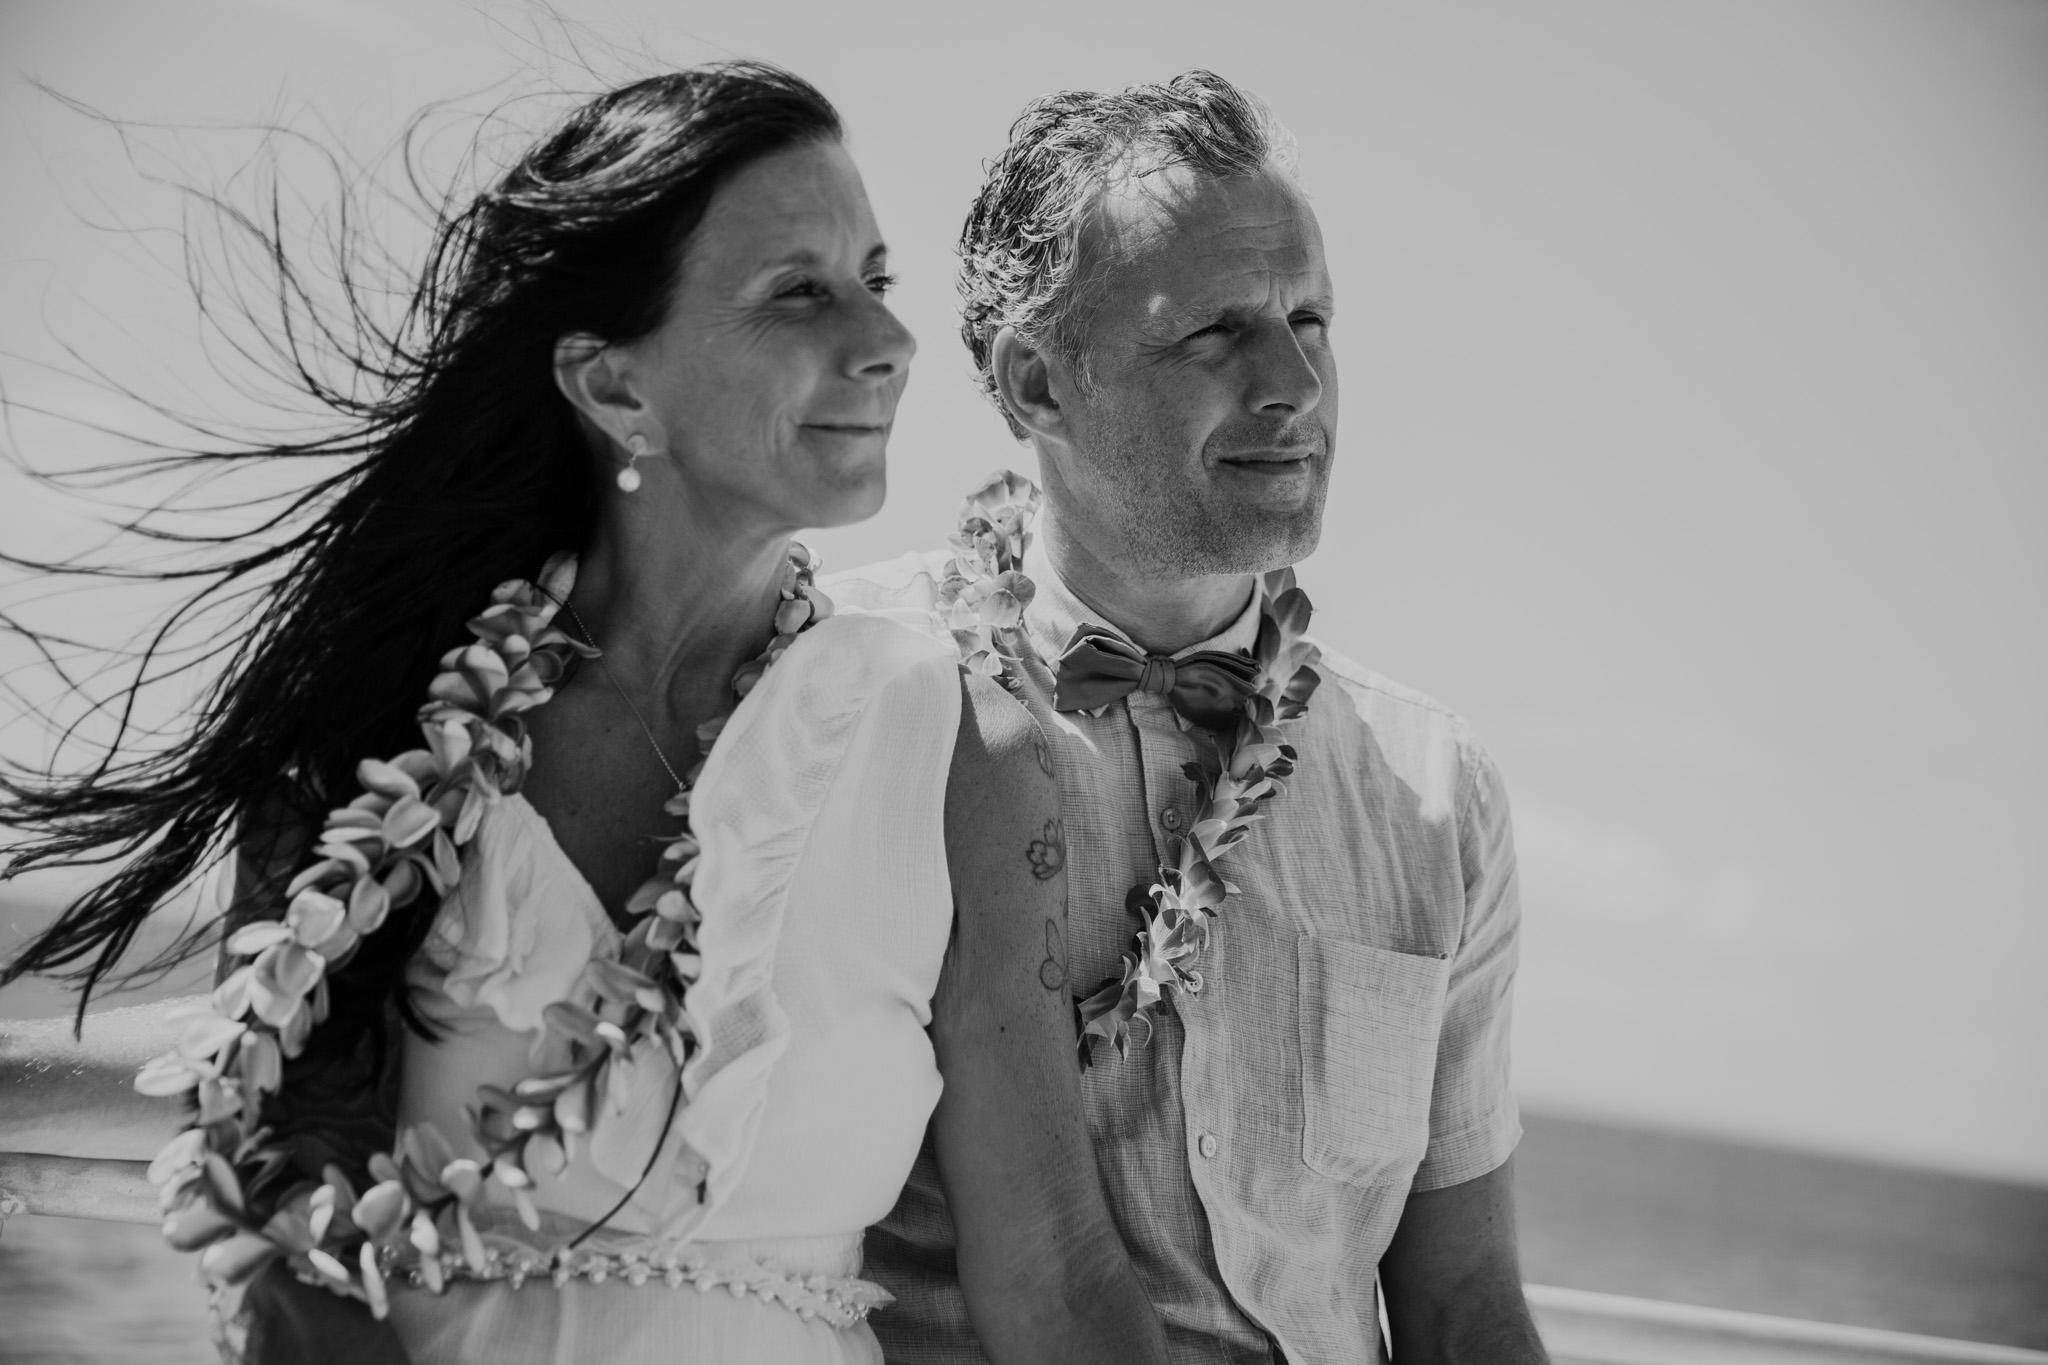 wedding-vow-renewal-hawaii-hochzeit-maui-silberhochzeit-karol-and-jens_140.jpg